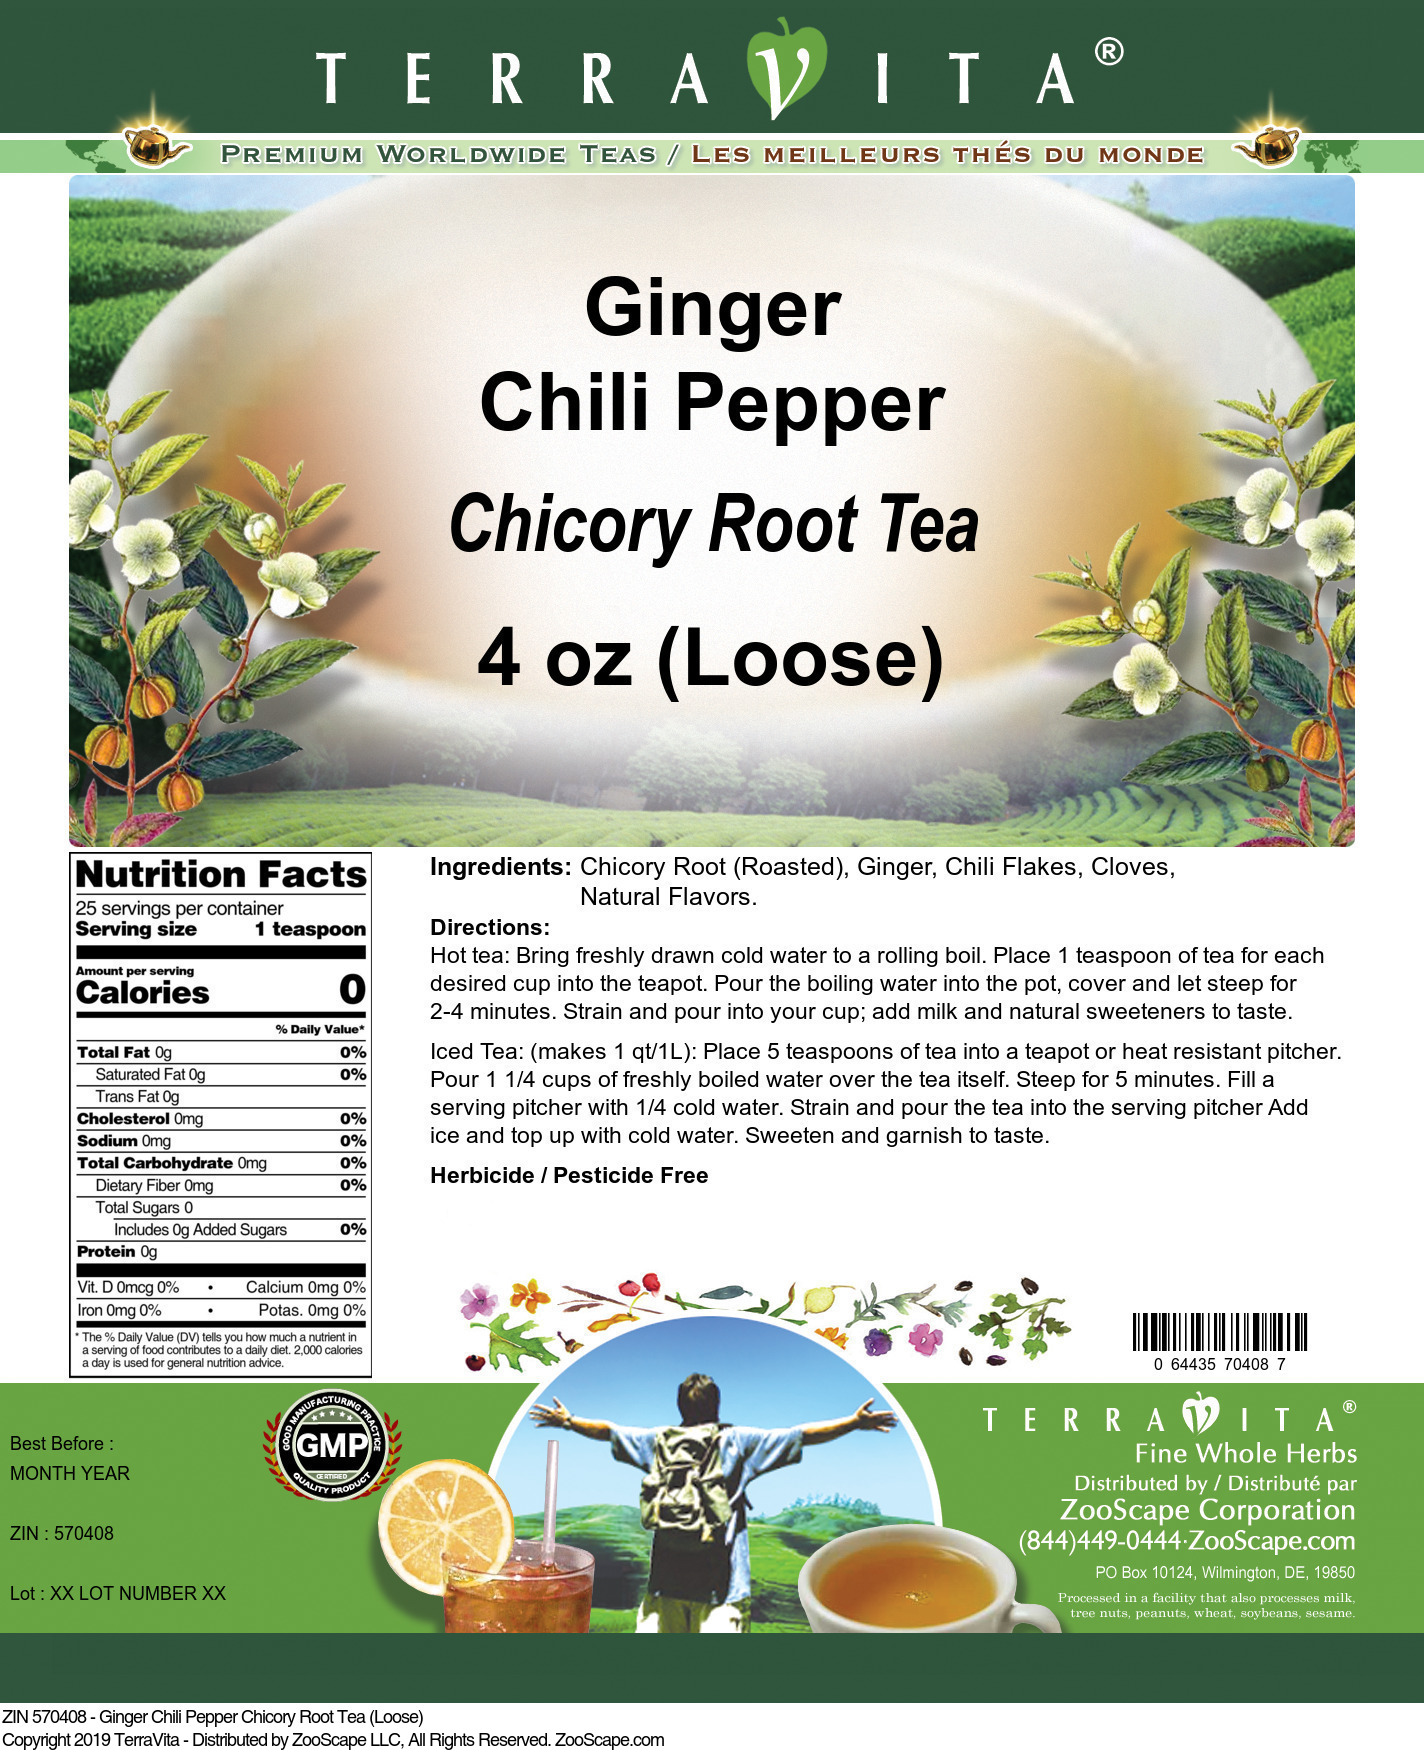 Ginger Chili Pepper Chicory Root